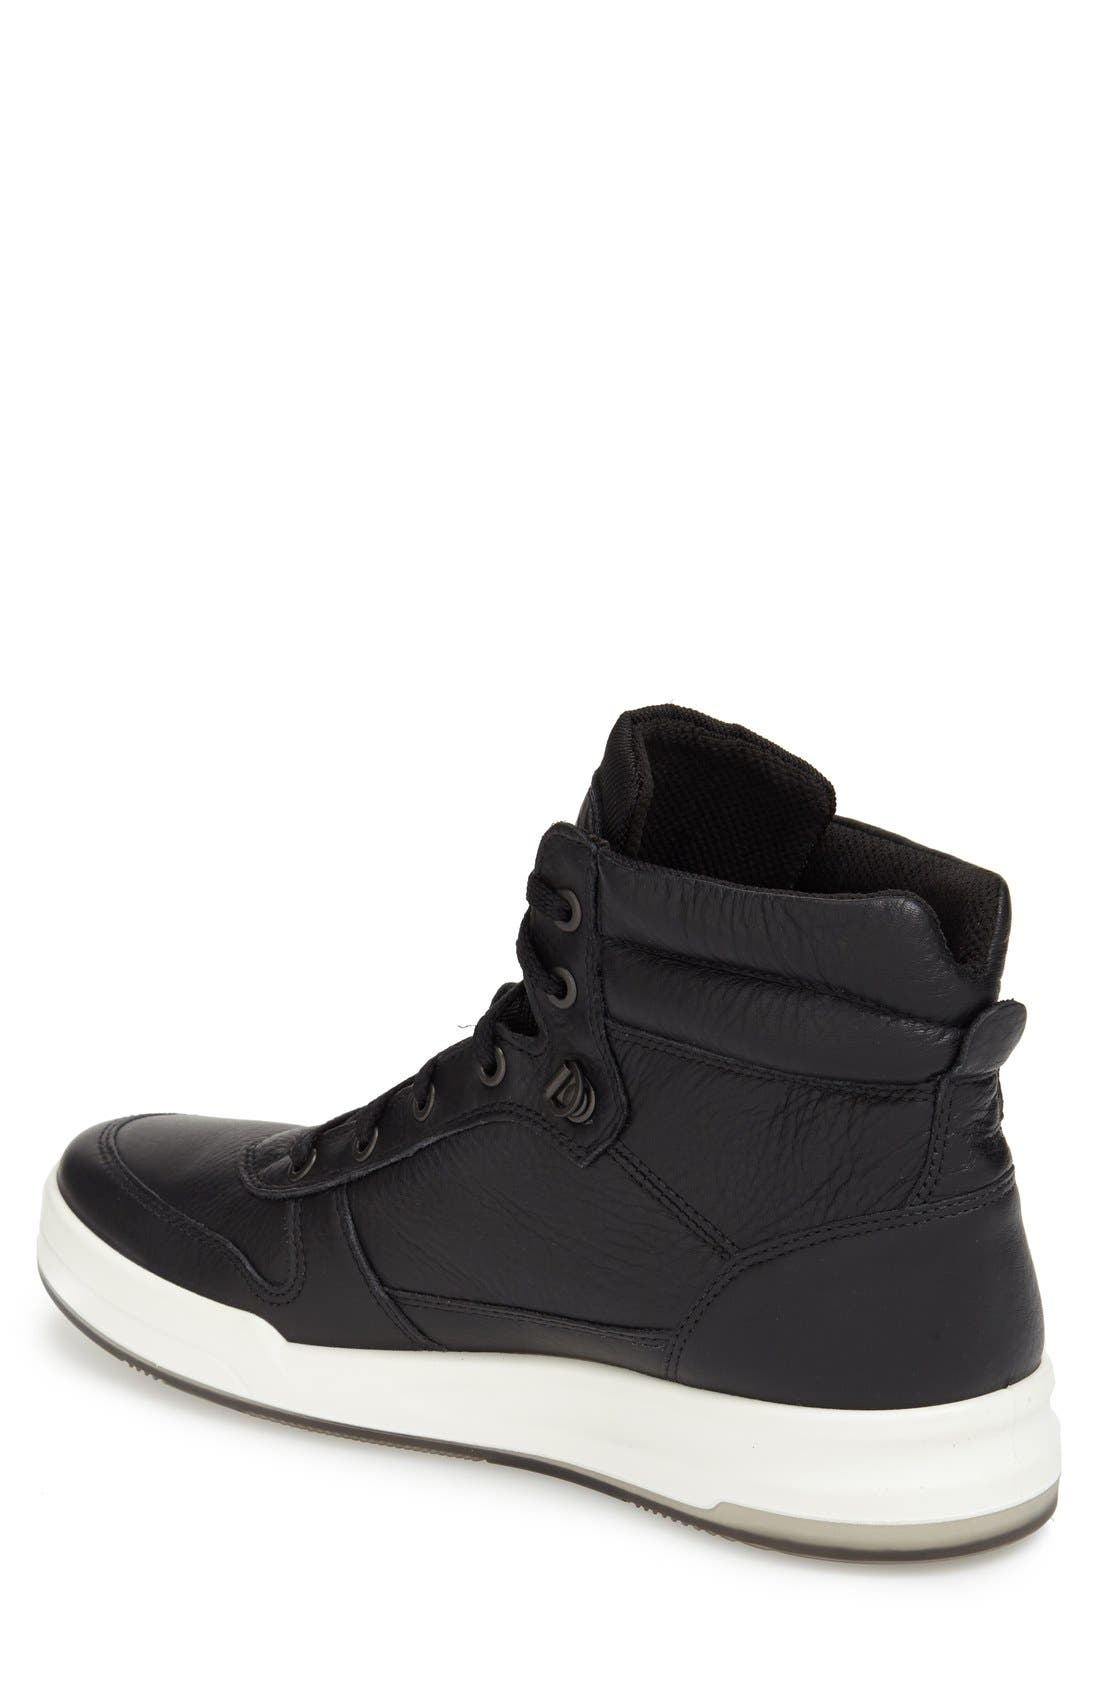 'Jack' High Top Sneaker,                             Alternate thumbnail 2, color,                             001